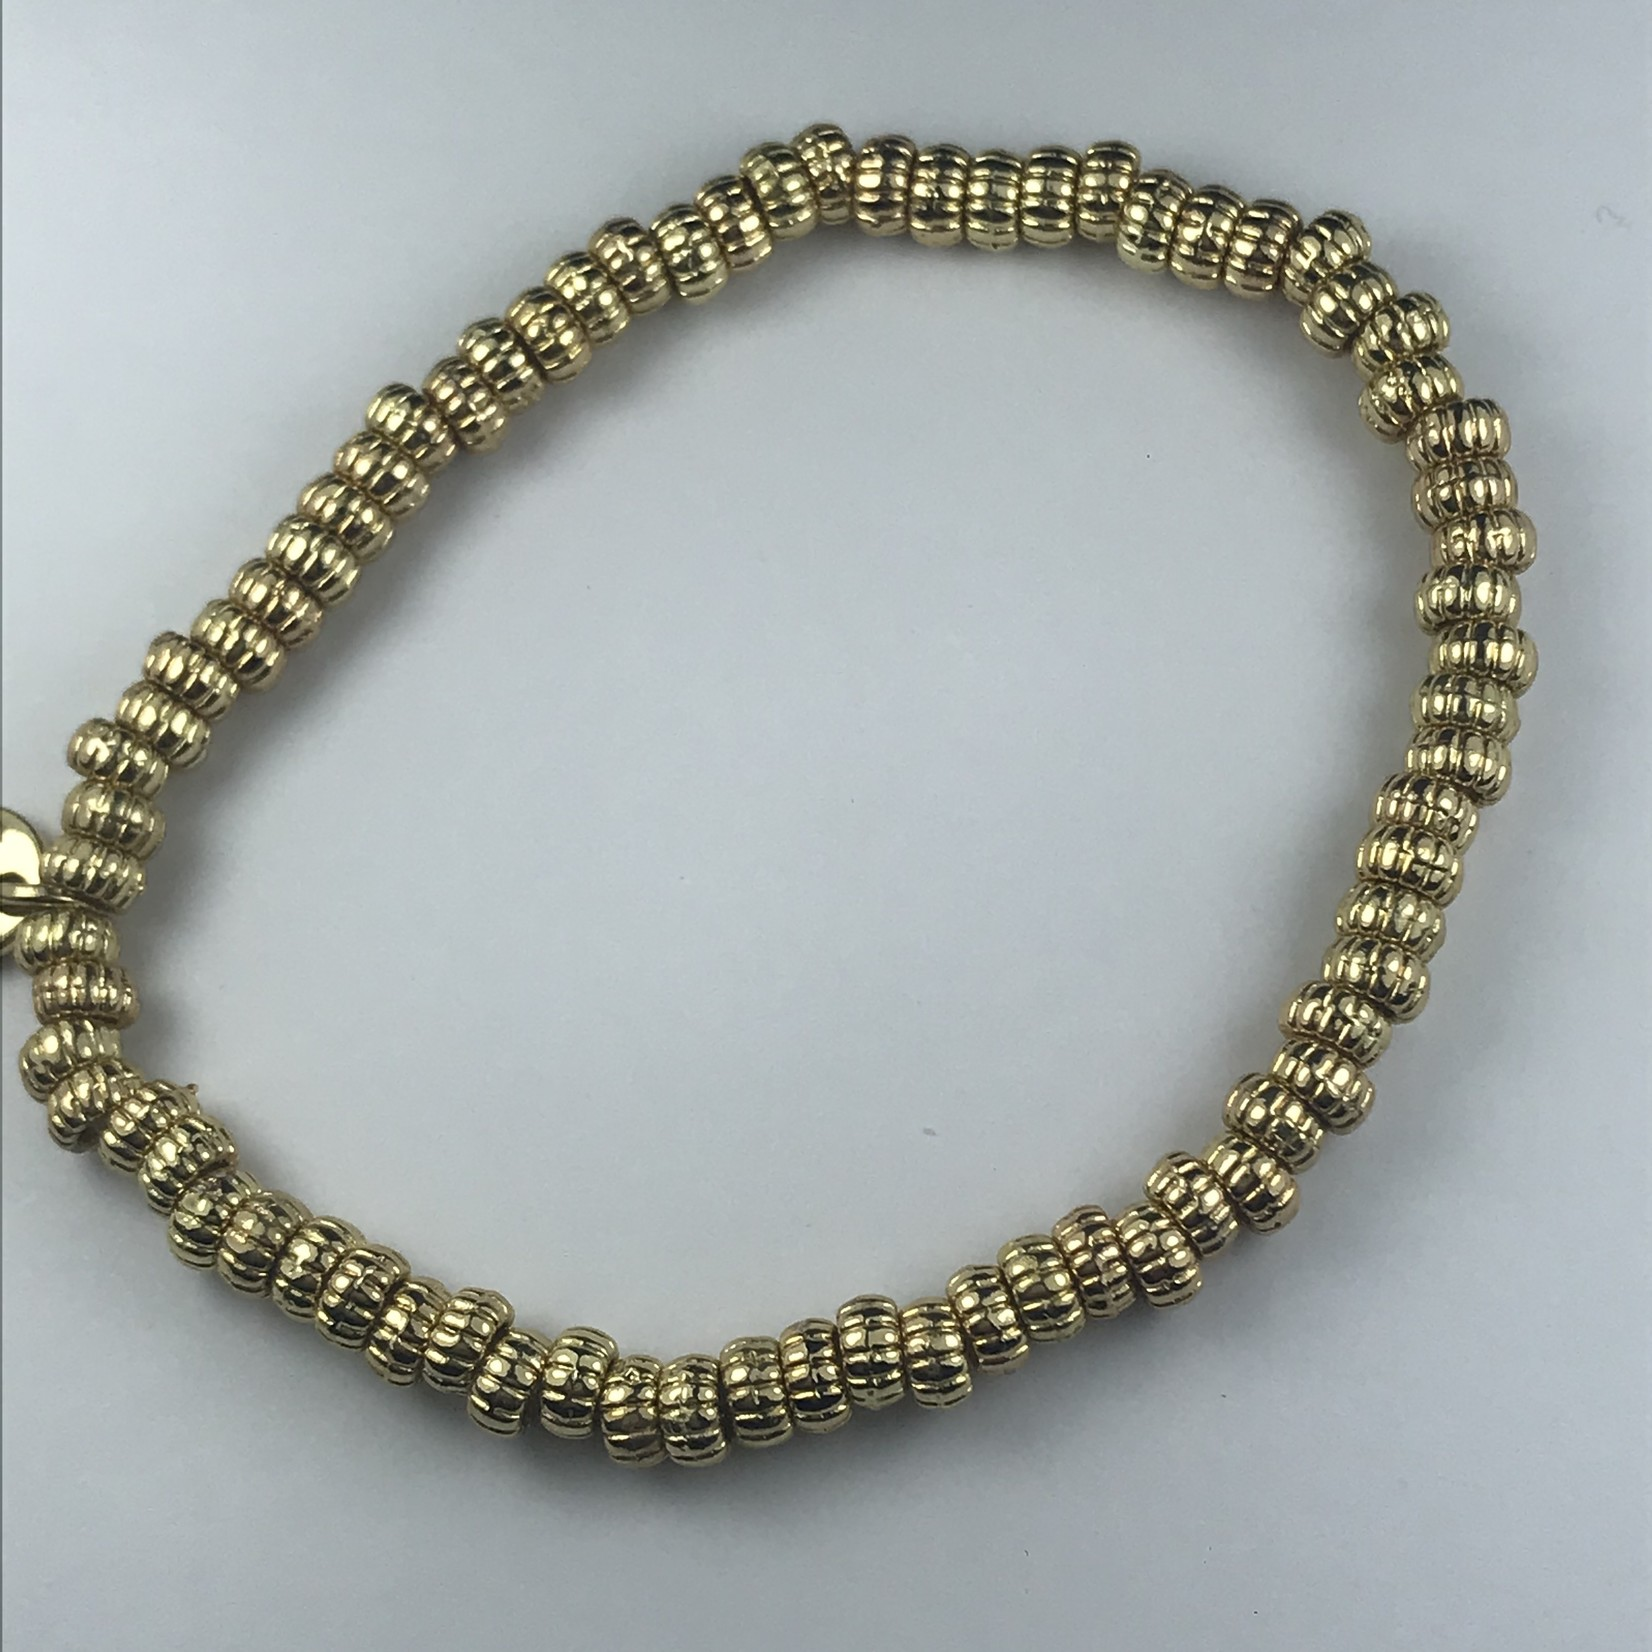 Biba armband goudkleurige fijne ringetjes